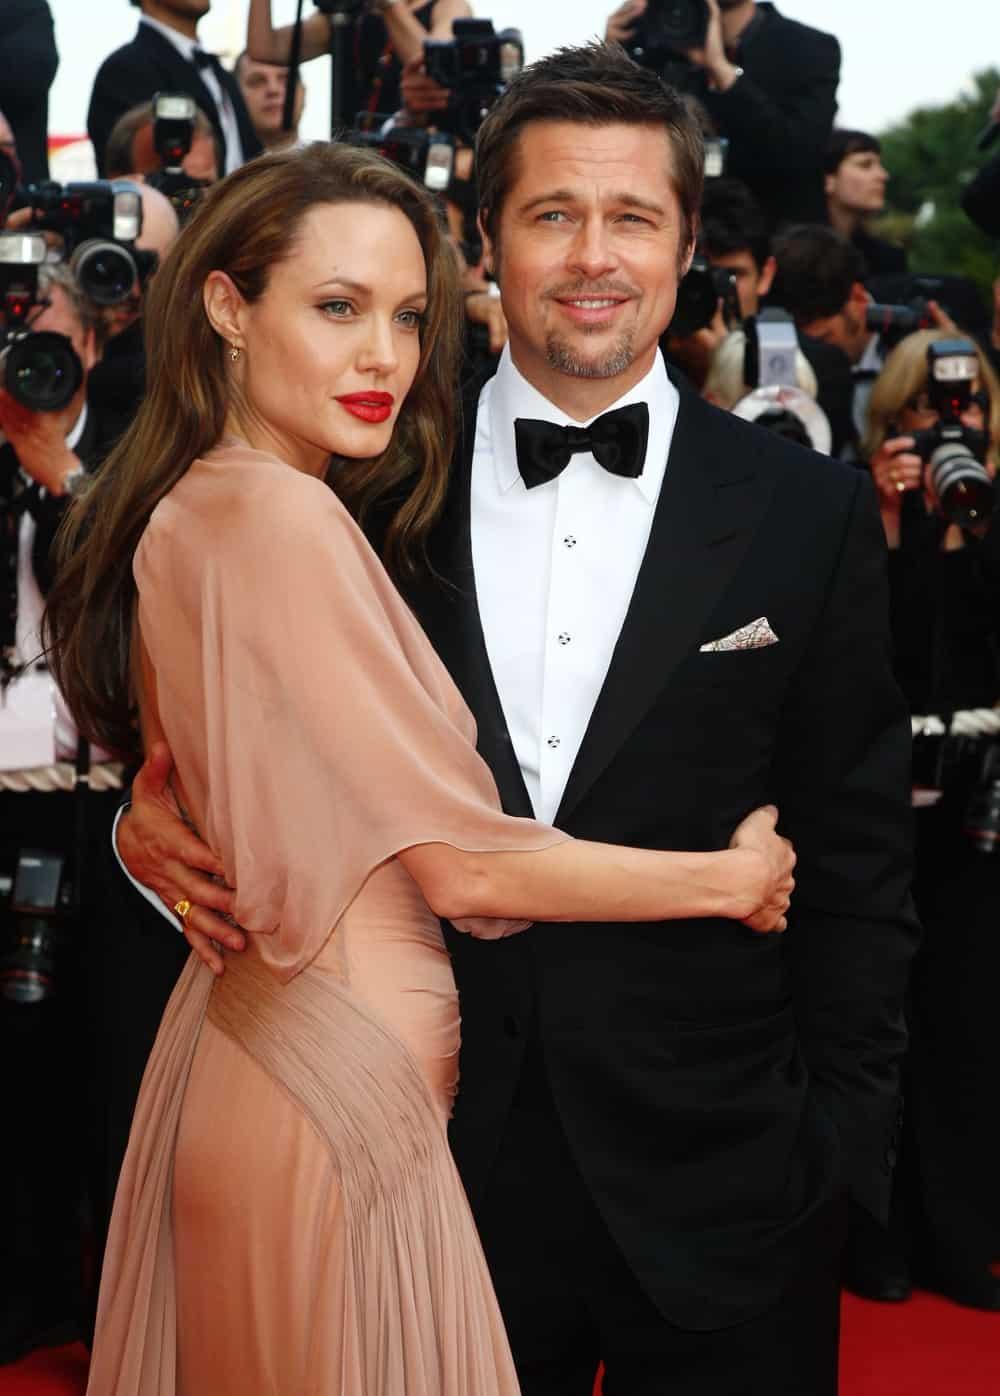 Angelina Jolie and Brad Pitt Inglourious Basterds Premiere - 2009 Cannes Film Festival